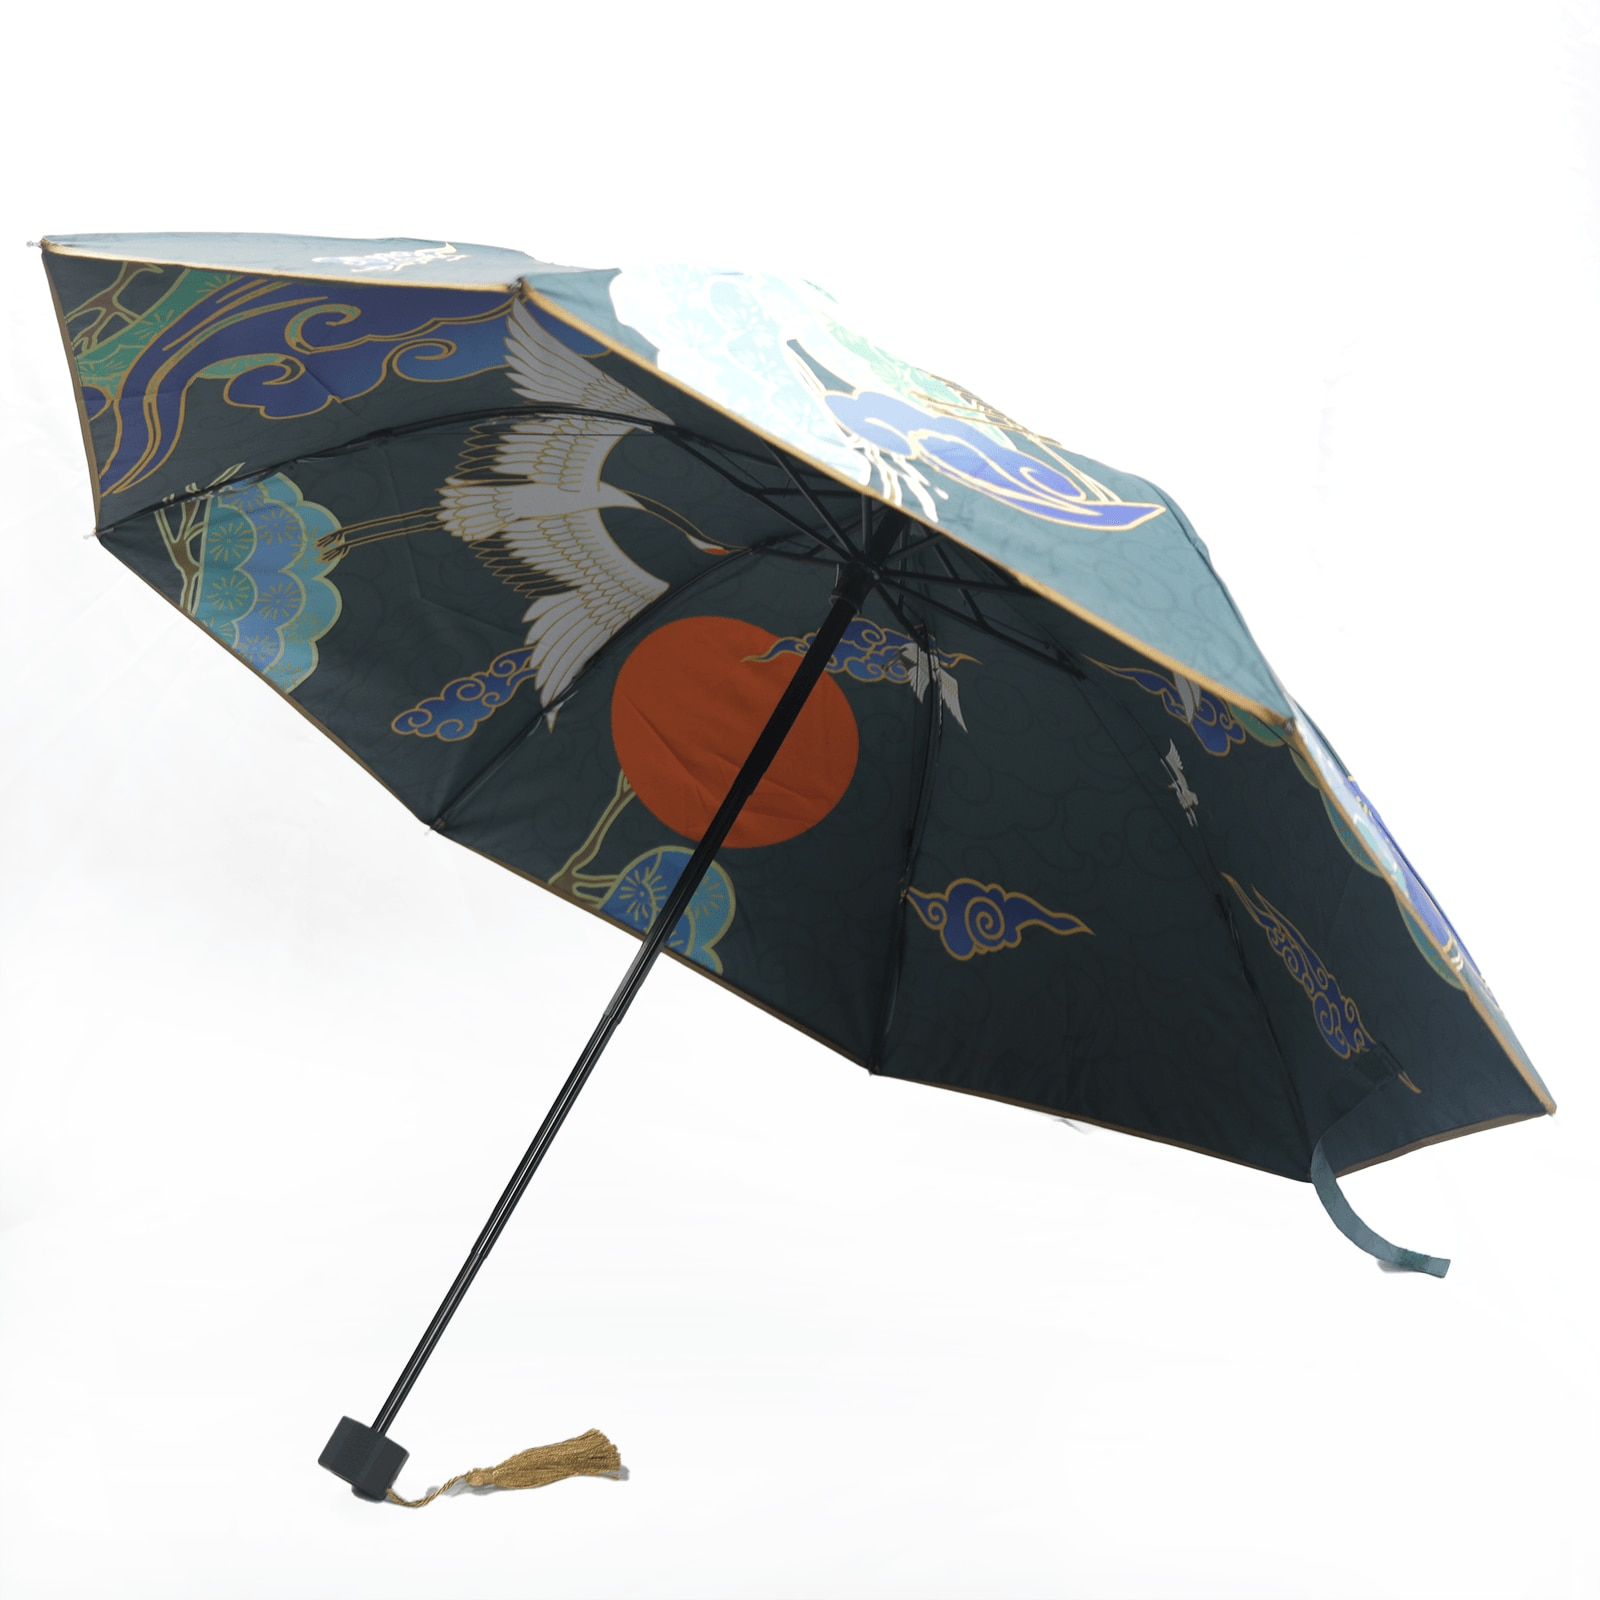 Guarda-chuva dobrável triplo estilo chinês de dupla camada de vinil guarda-chuva all-weather anime